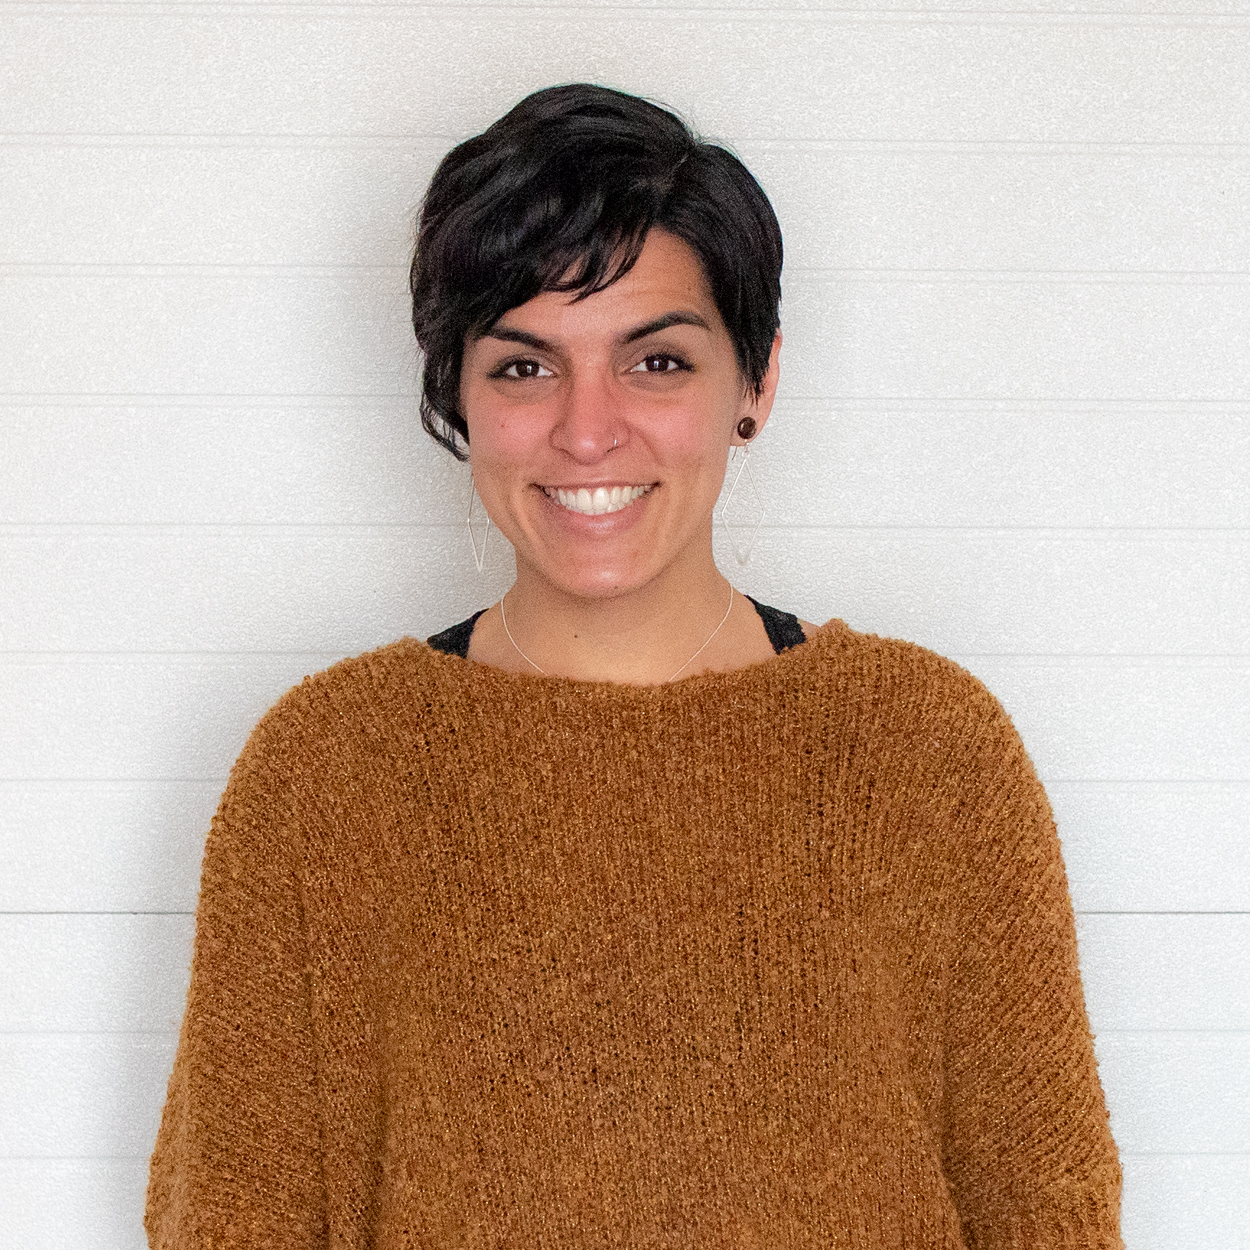 Briana Blanchard   Responsive Arts Leader, Missio Dei Central